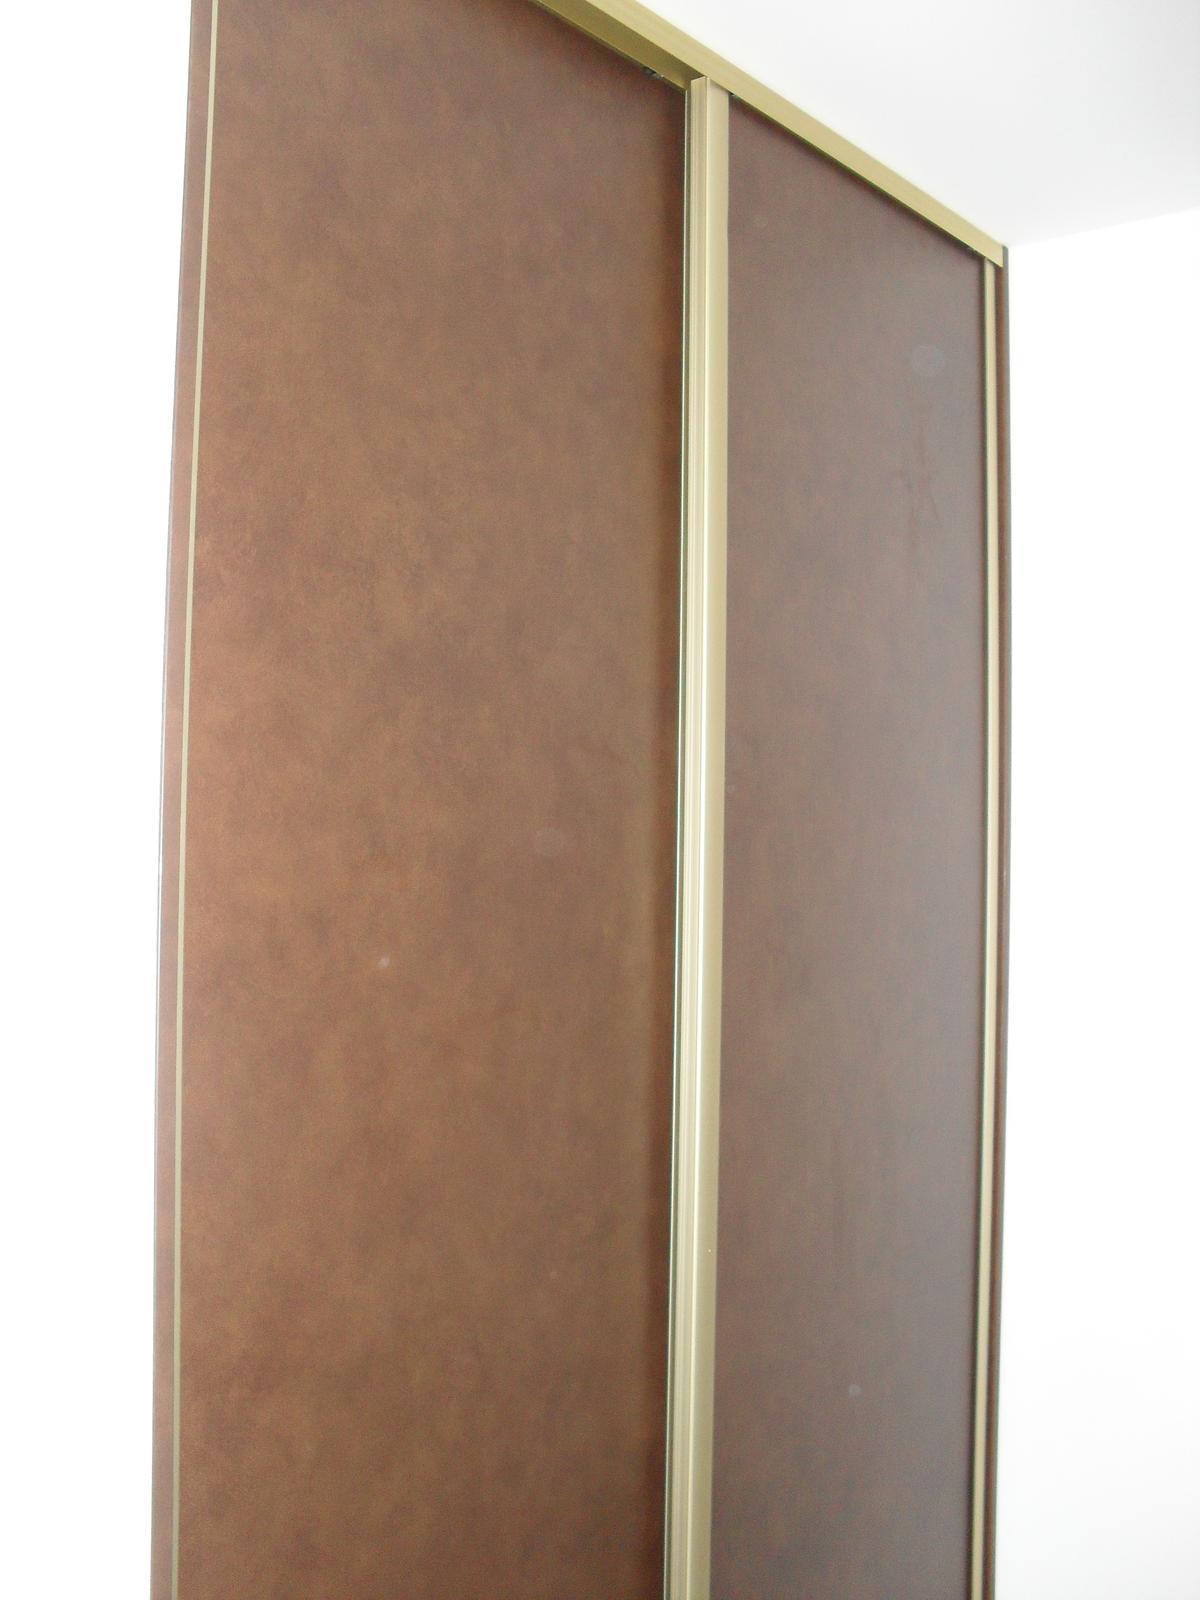 Vstavané skrine Martin Benko Bošany - Obrázok č. 130